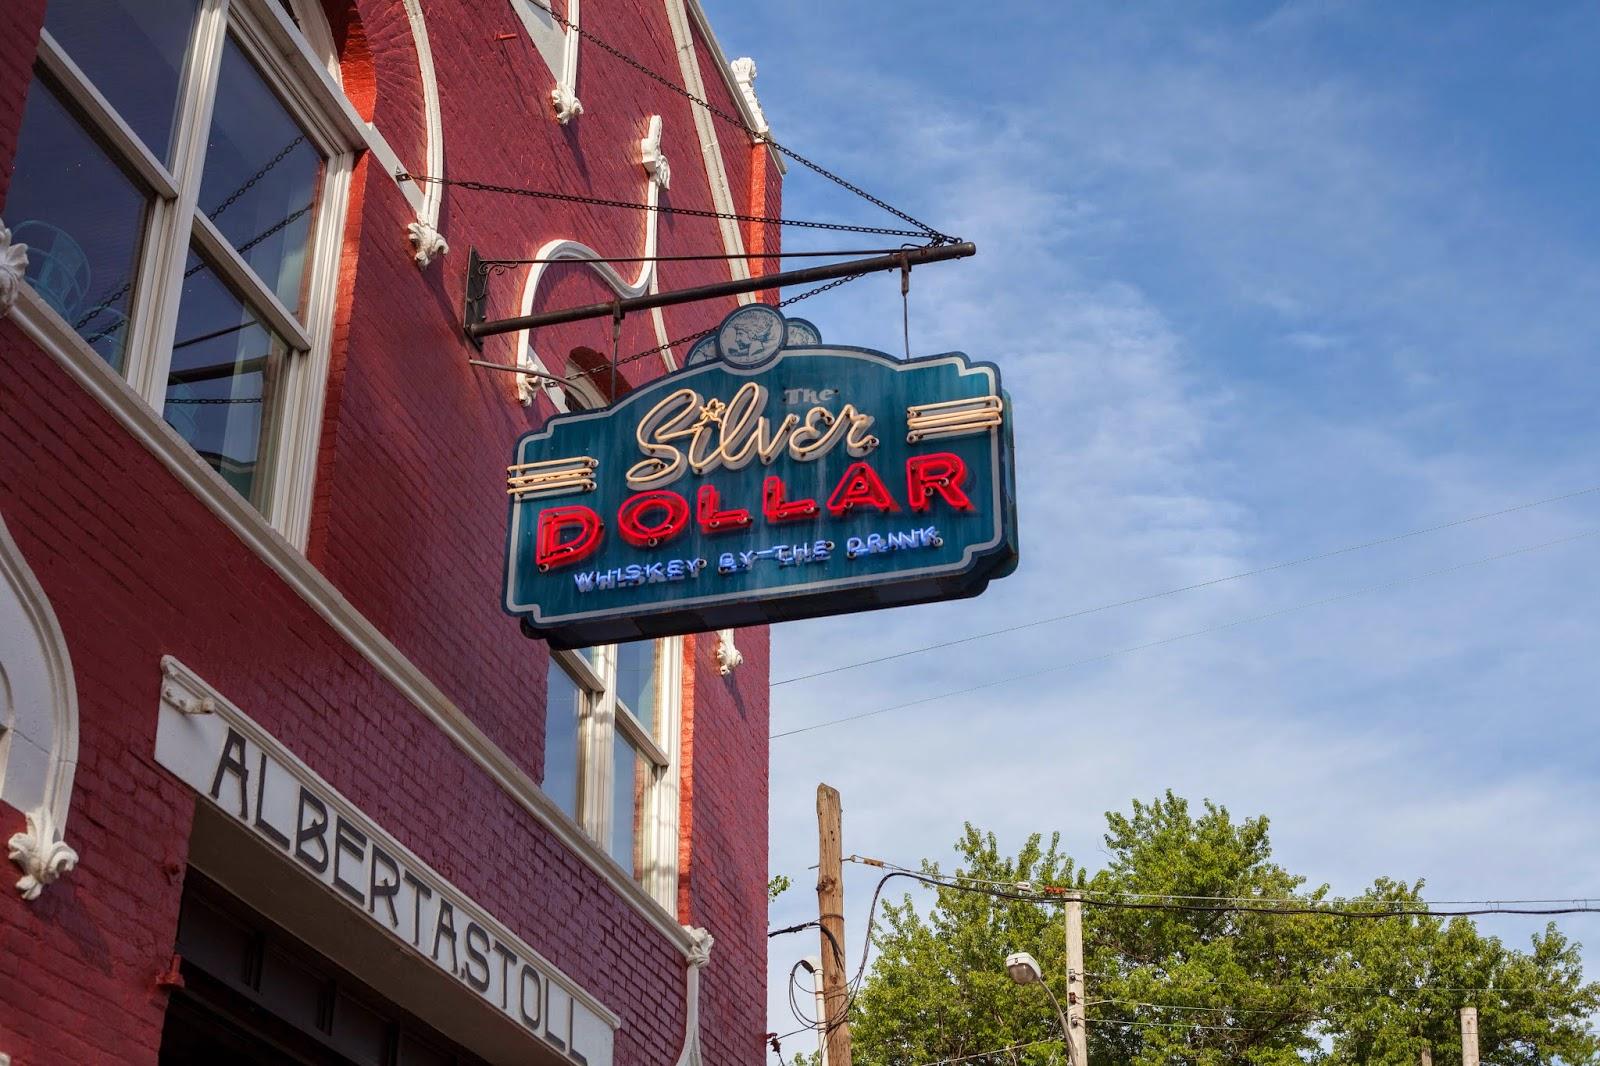 Louisville Silver Dollar